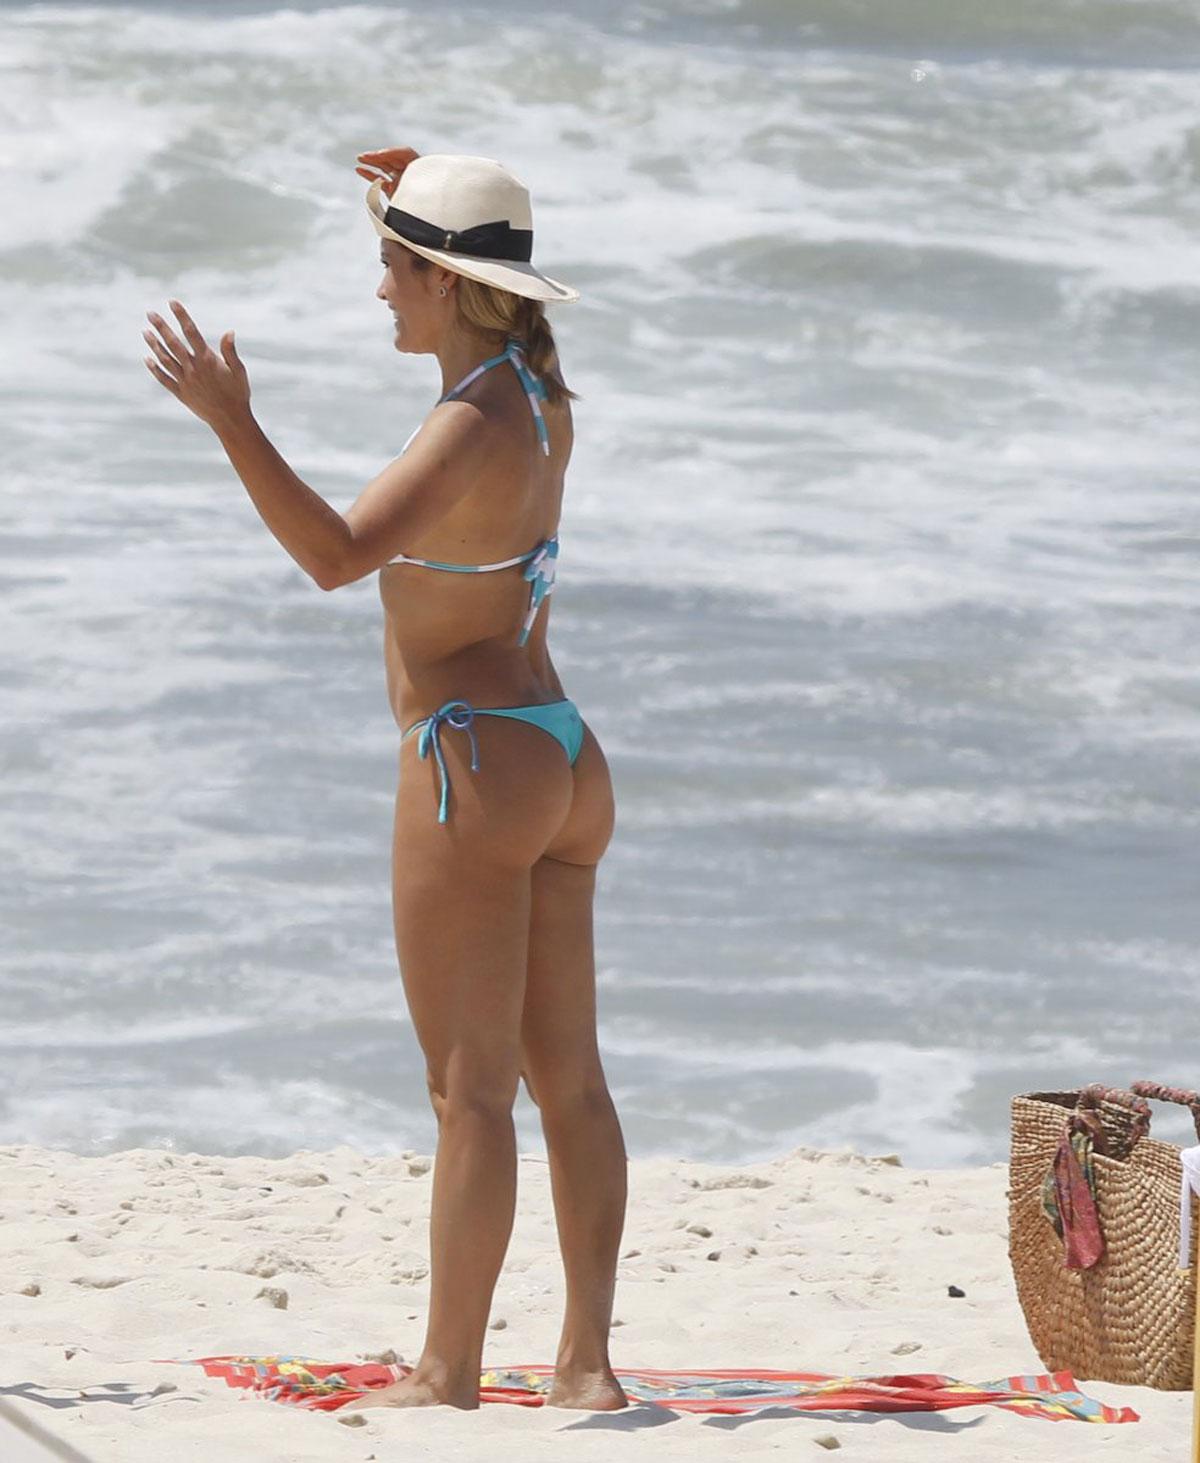 Hot Flavia Alessandra nude (79 foto and video), Topless, Bikini, Boobs, braless 2020